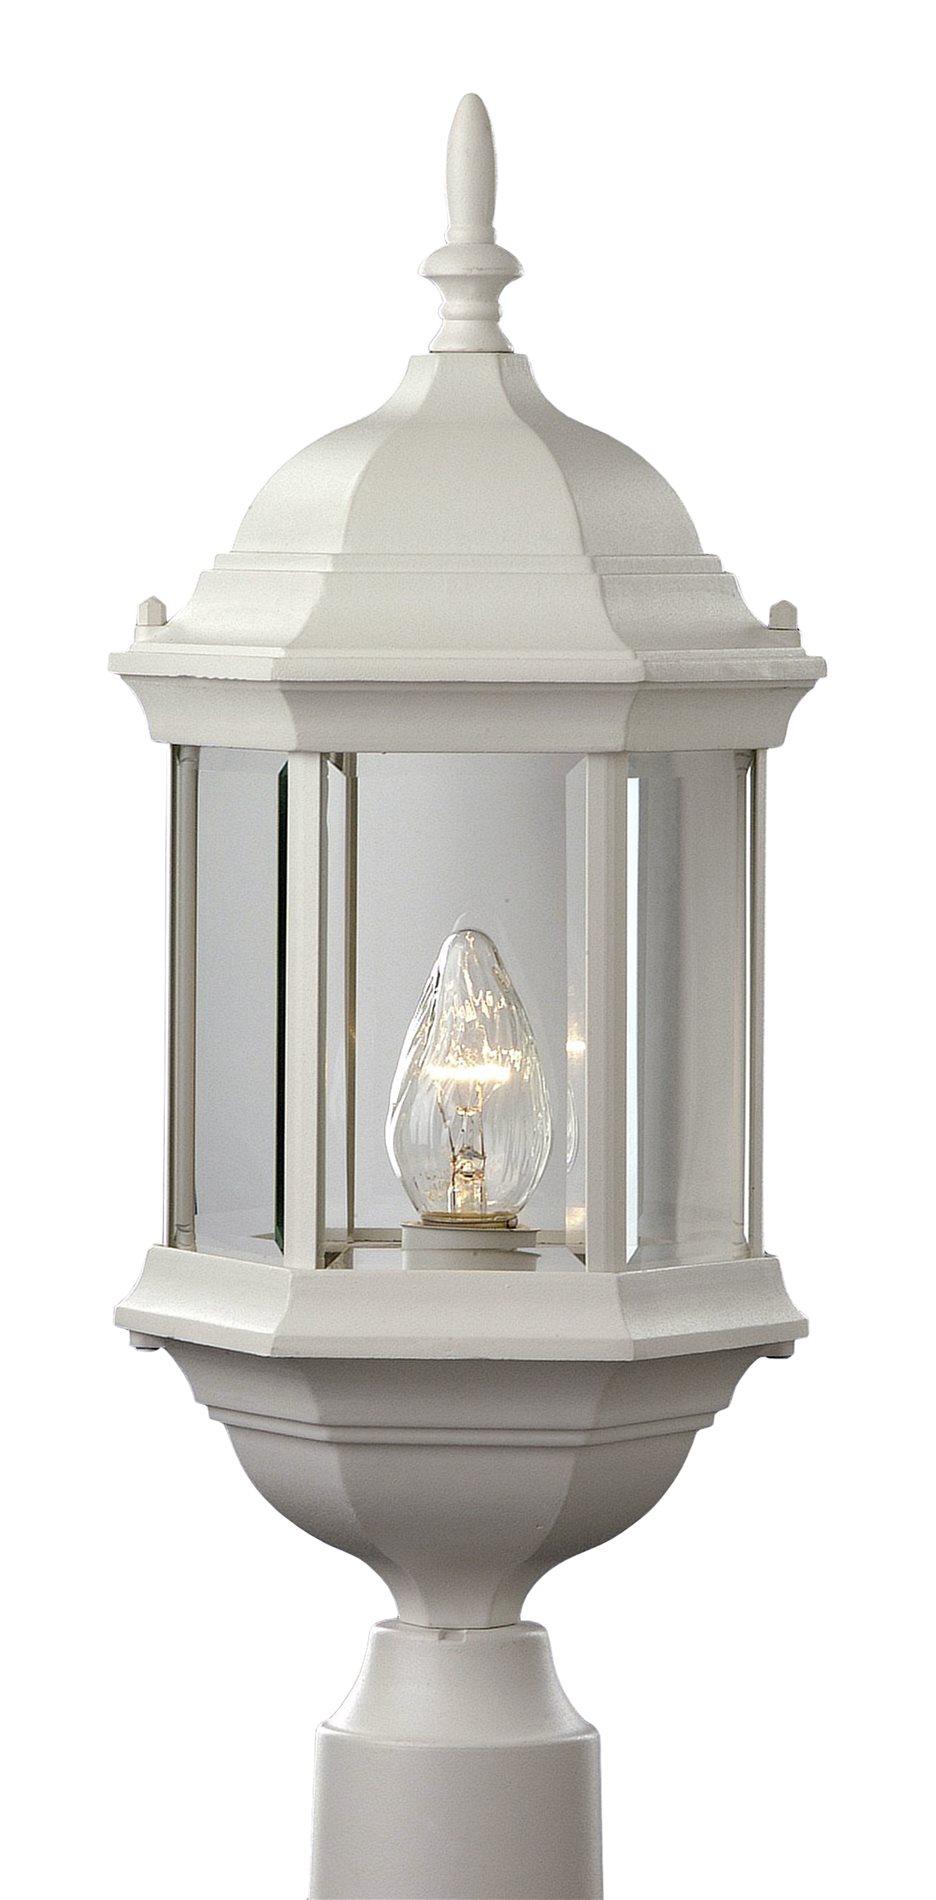 trans globe lighting 4352 transitional outdoor post lantern light tg 4352. Black Bedroom Furniture Sets. Home Design Ideas